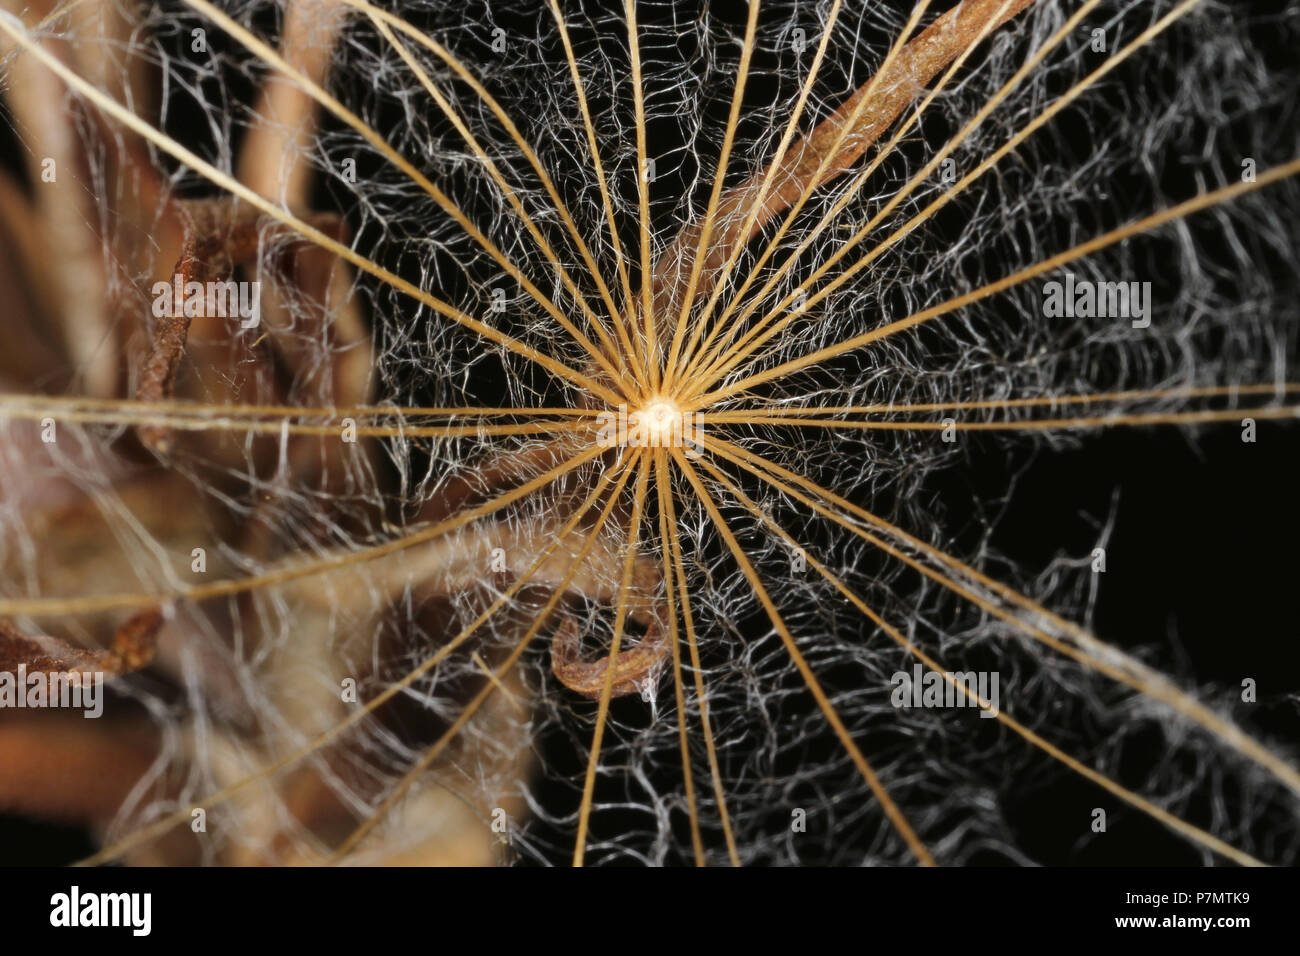 Fluff of achene of Goat's-beard (Tragopogon pratensis) - Stock Image